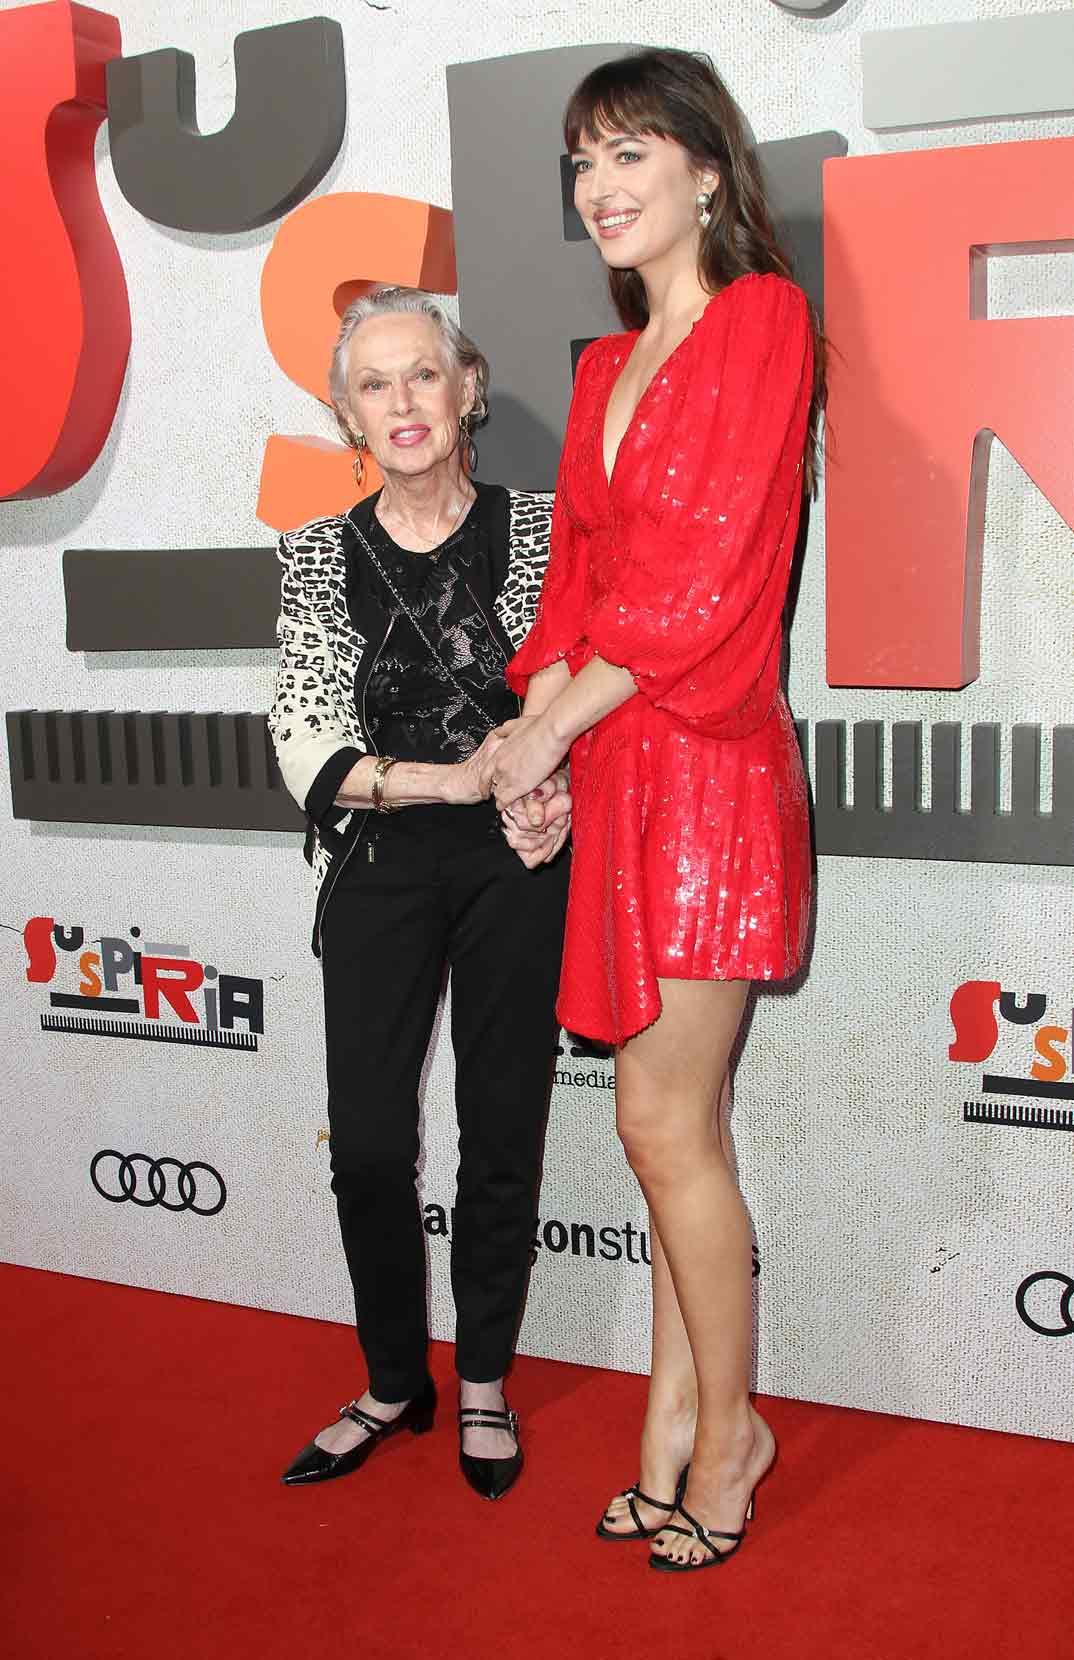 Dakota Johnson con su abuela Tippi Hedren